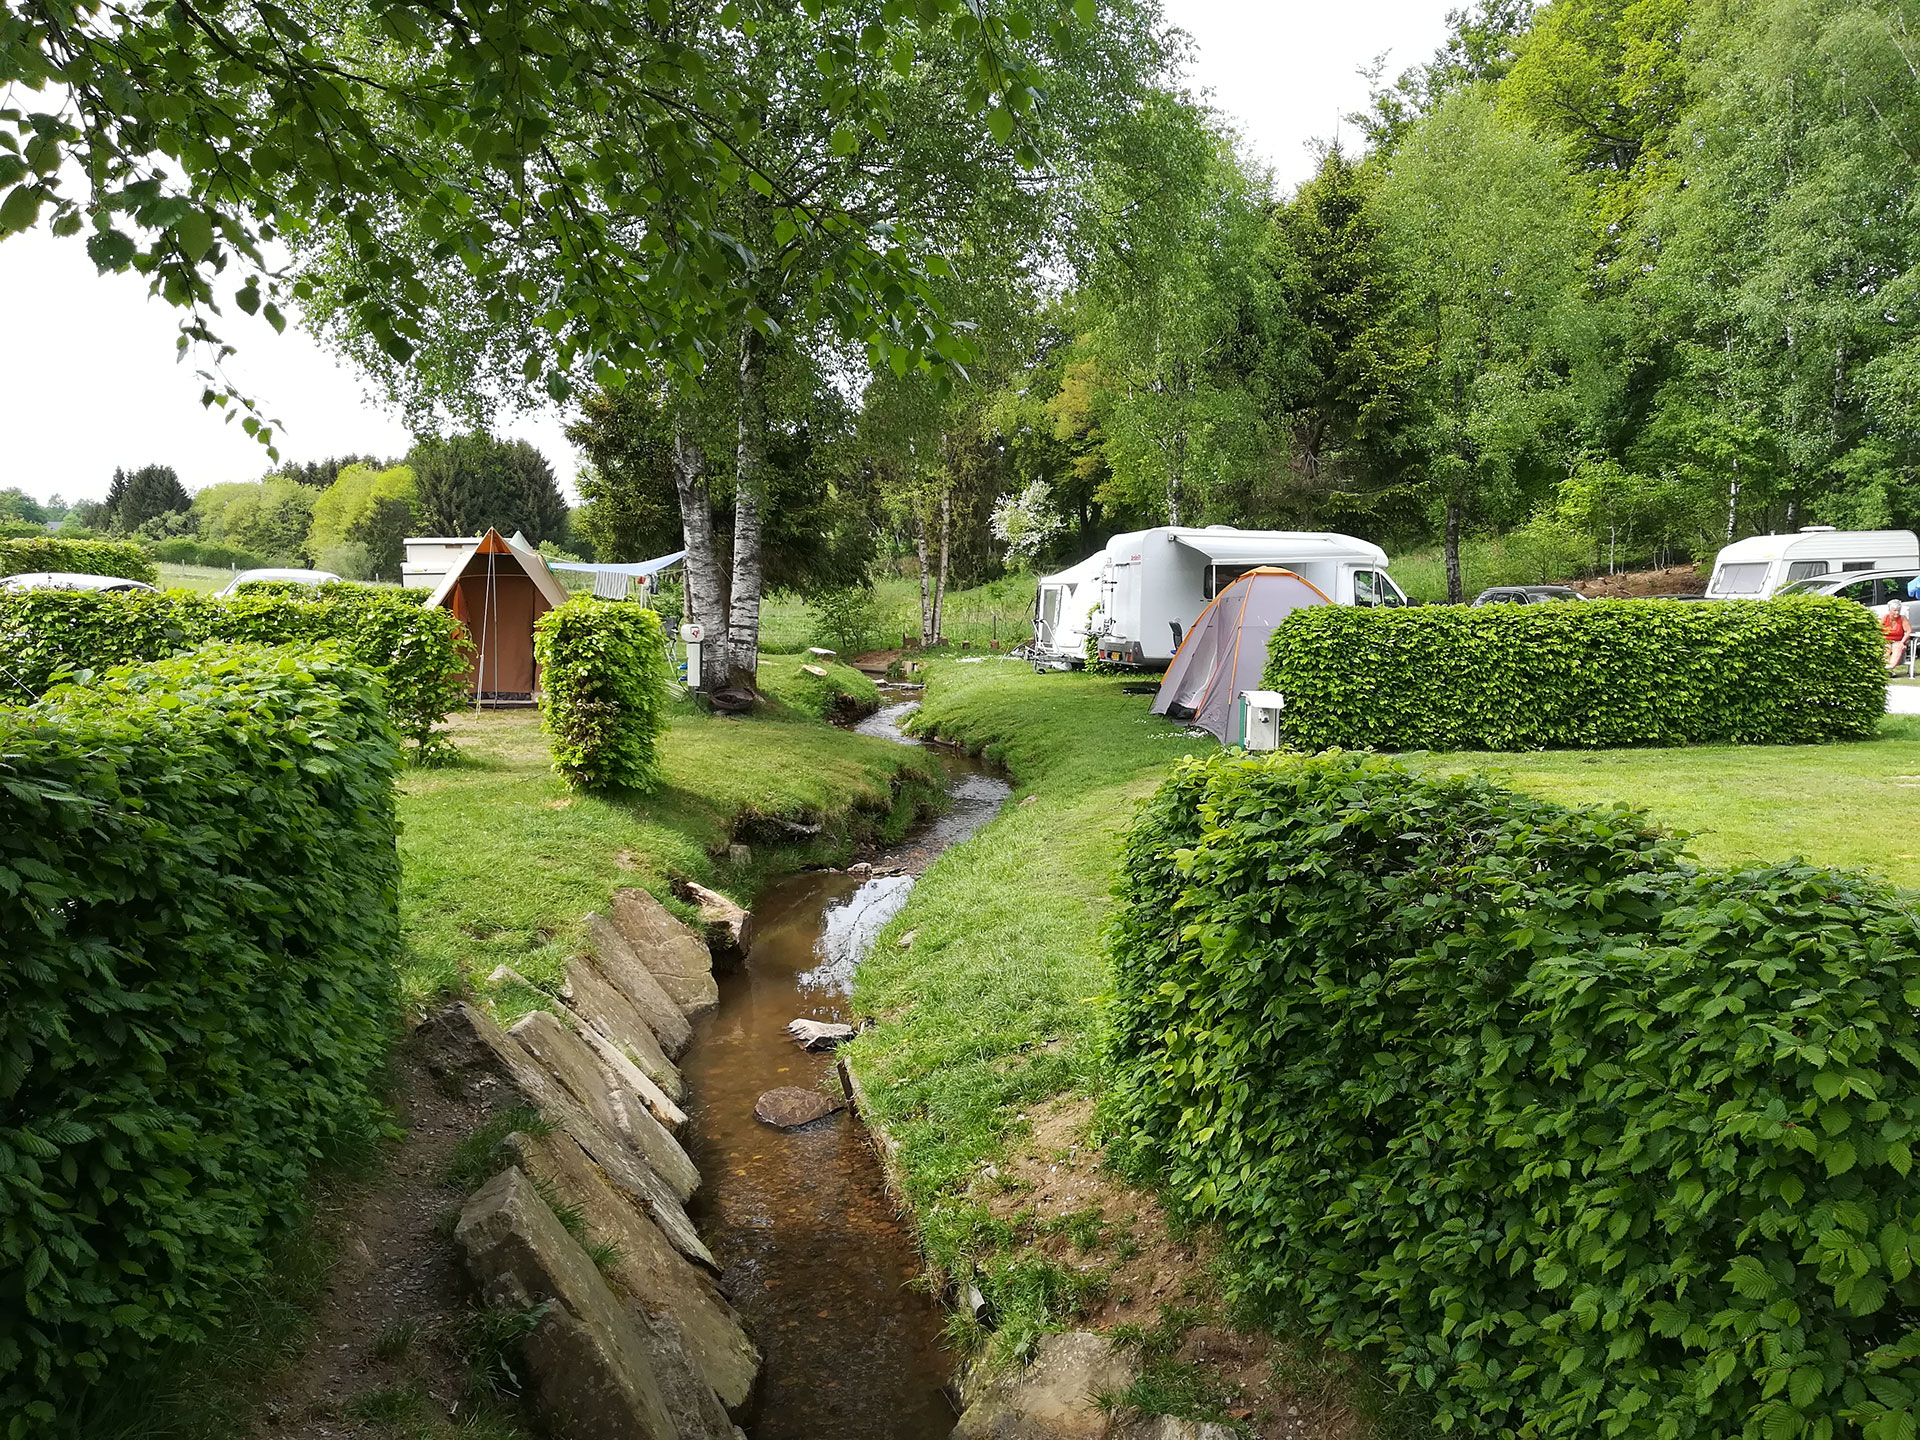 Camping en Wallonie - camp - campement - bivouac - caravane - ruisseau